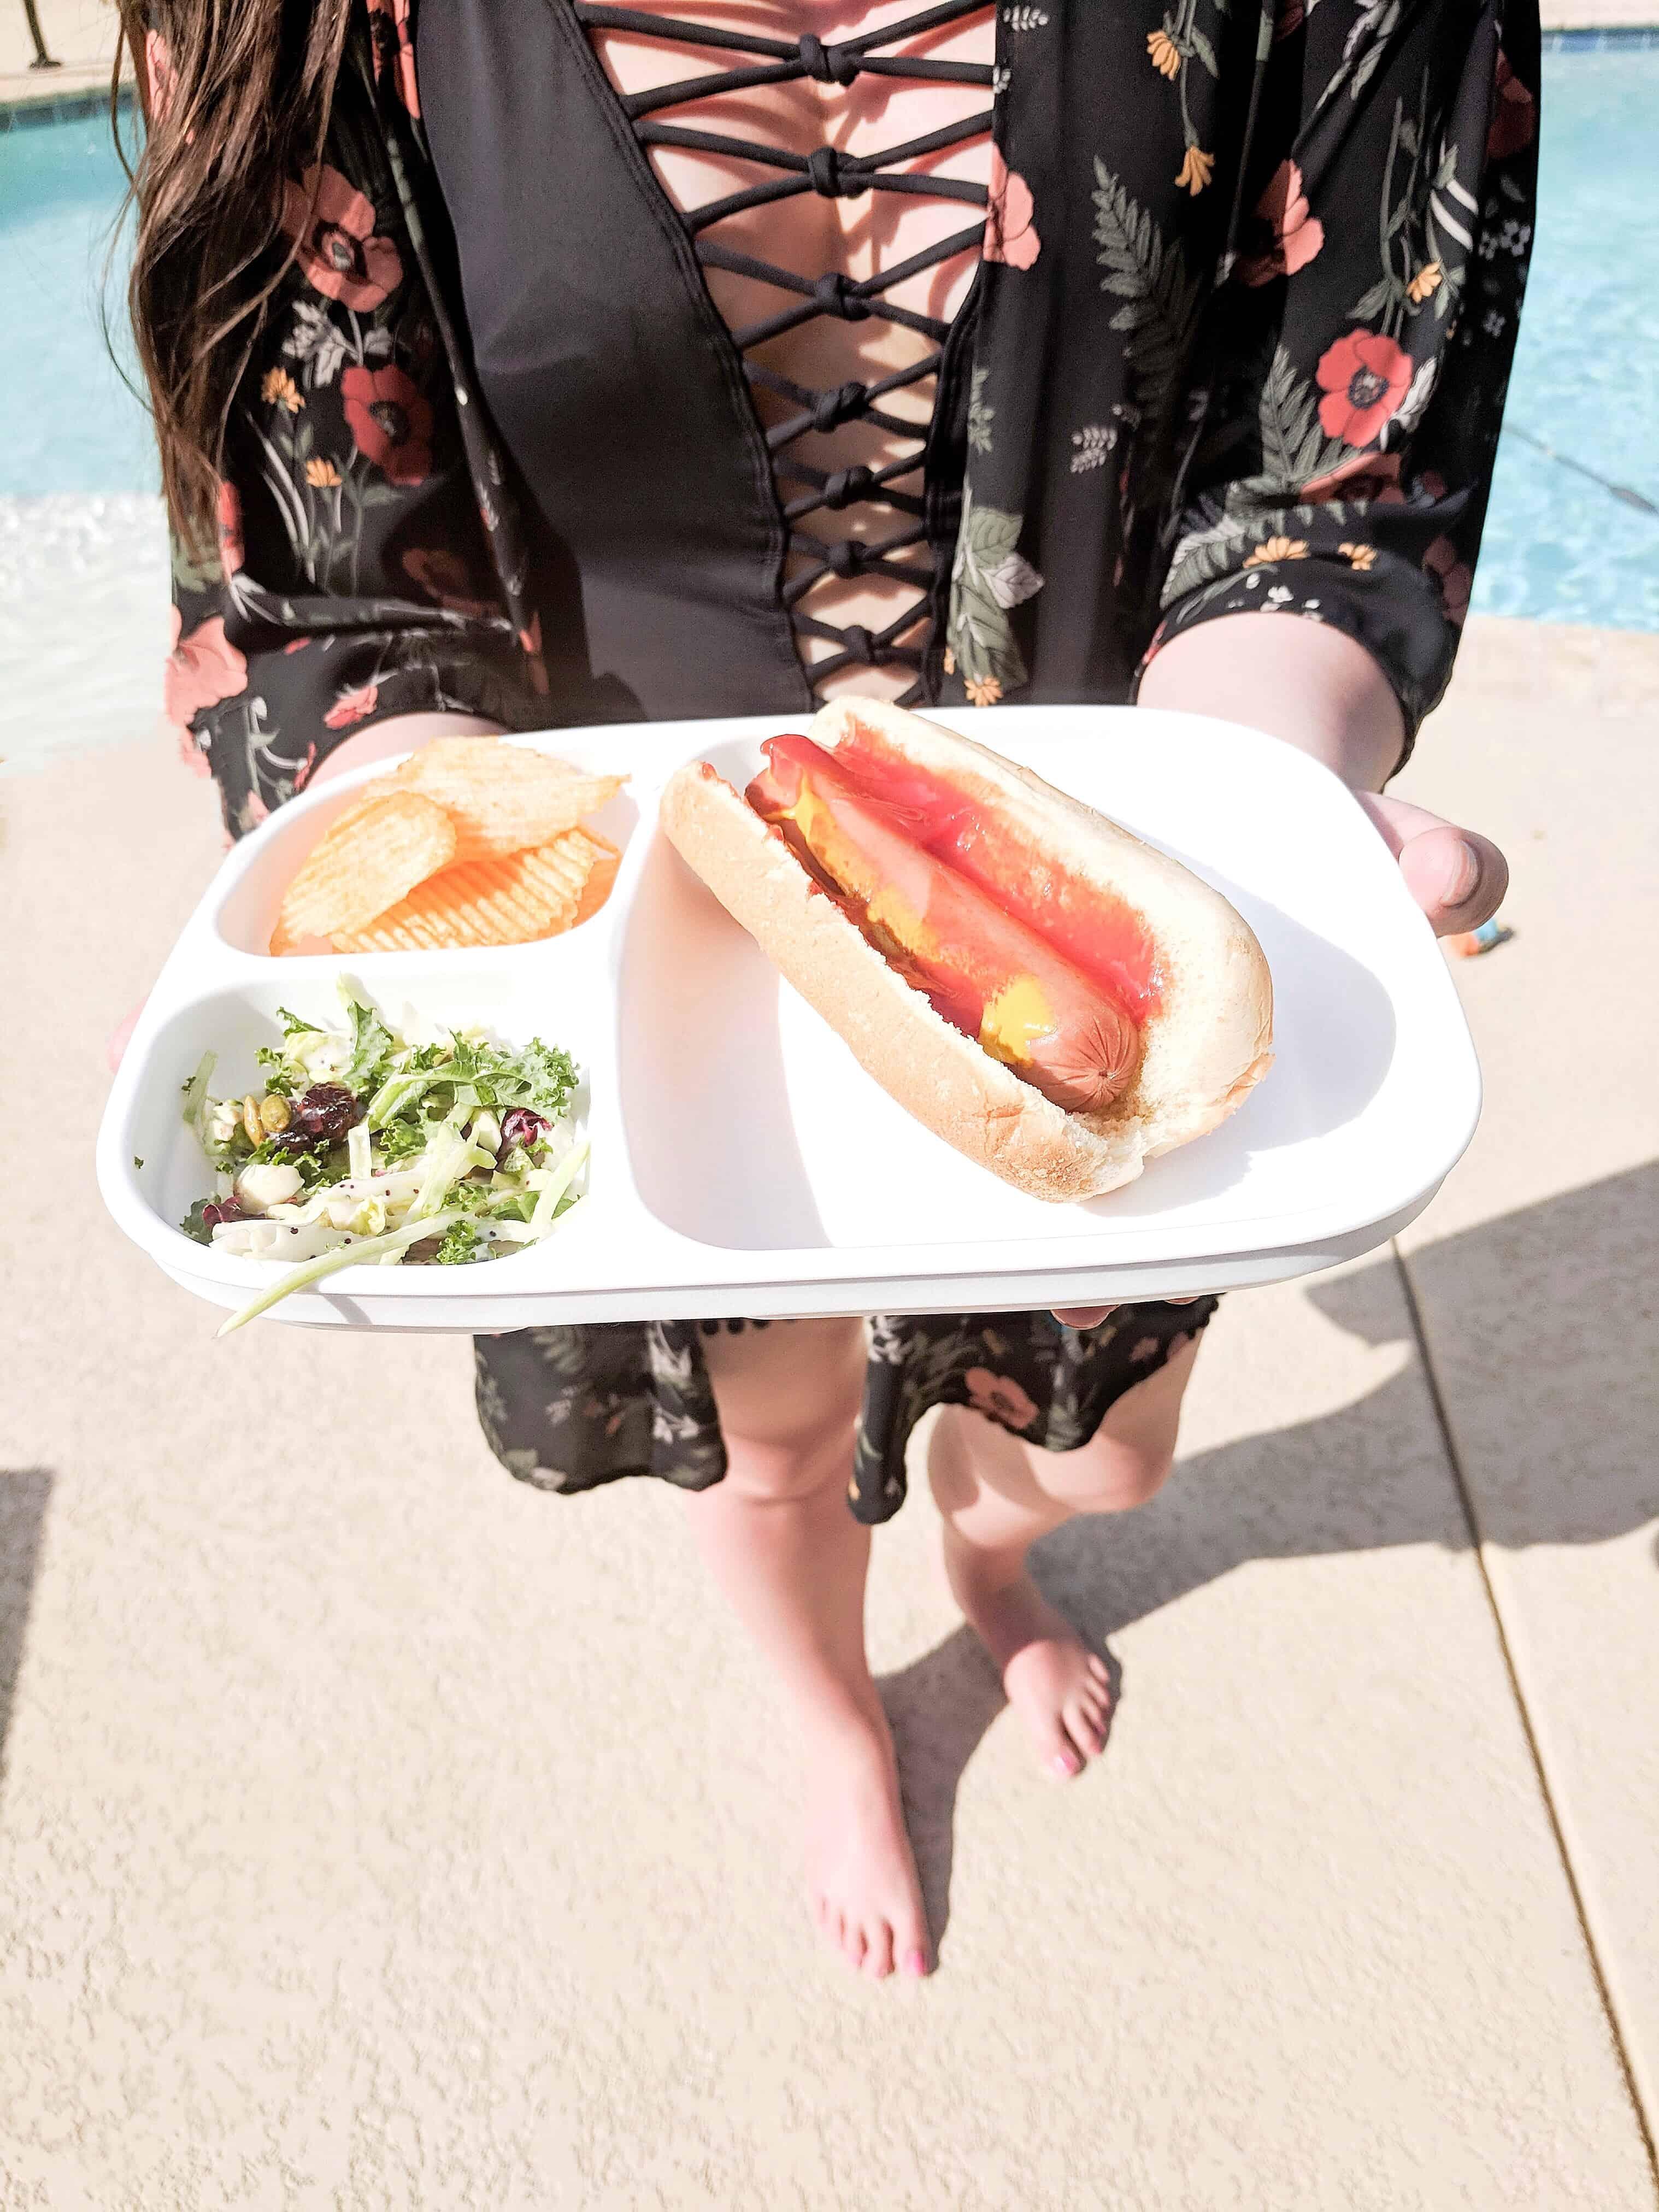 plate of food pool side